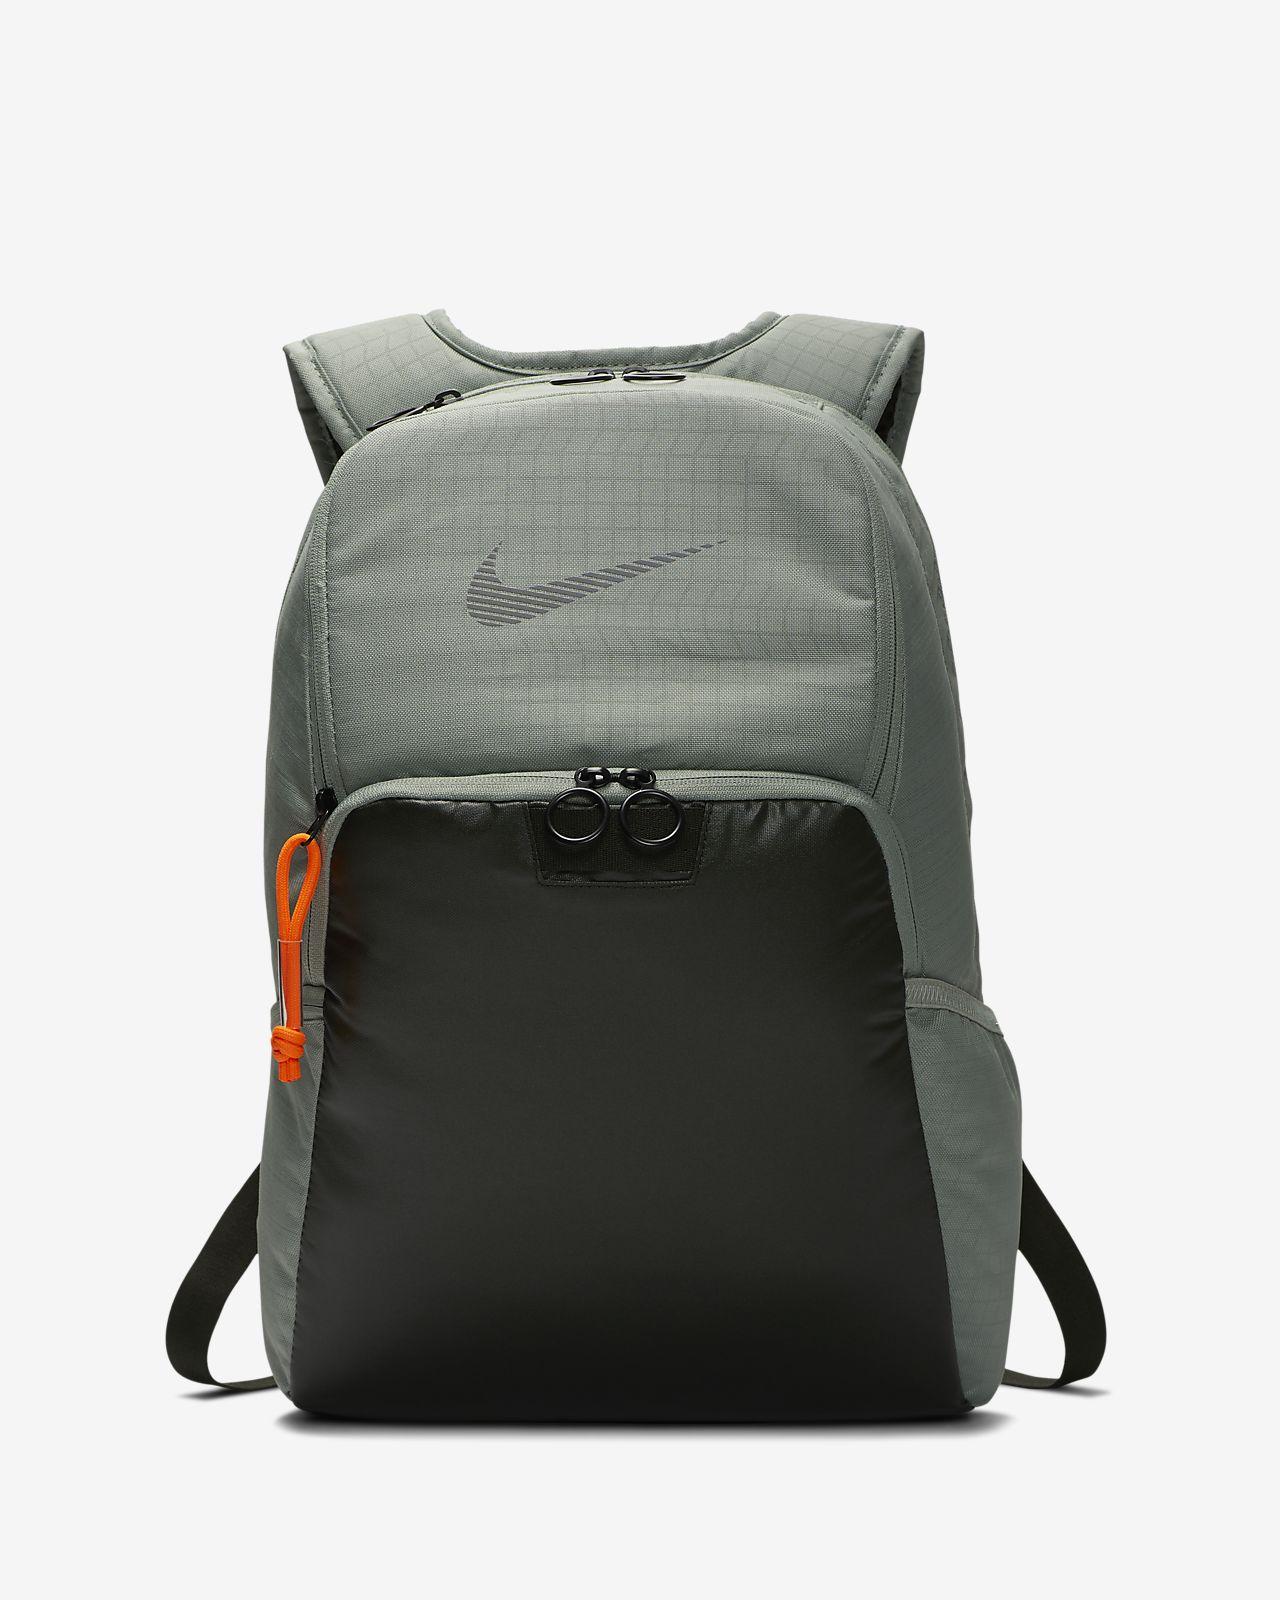 Nike Brasilia winterfester Trainingsrucksack